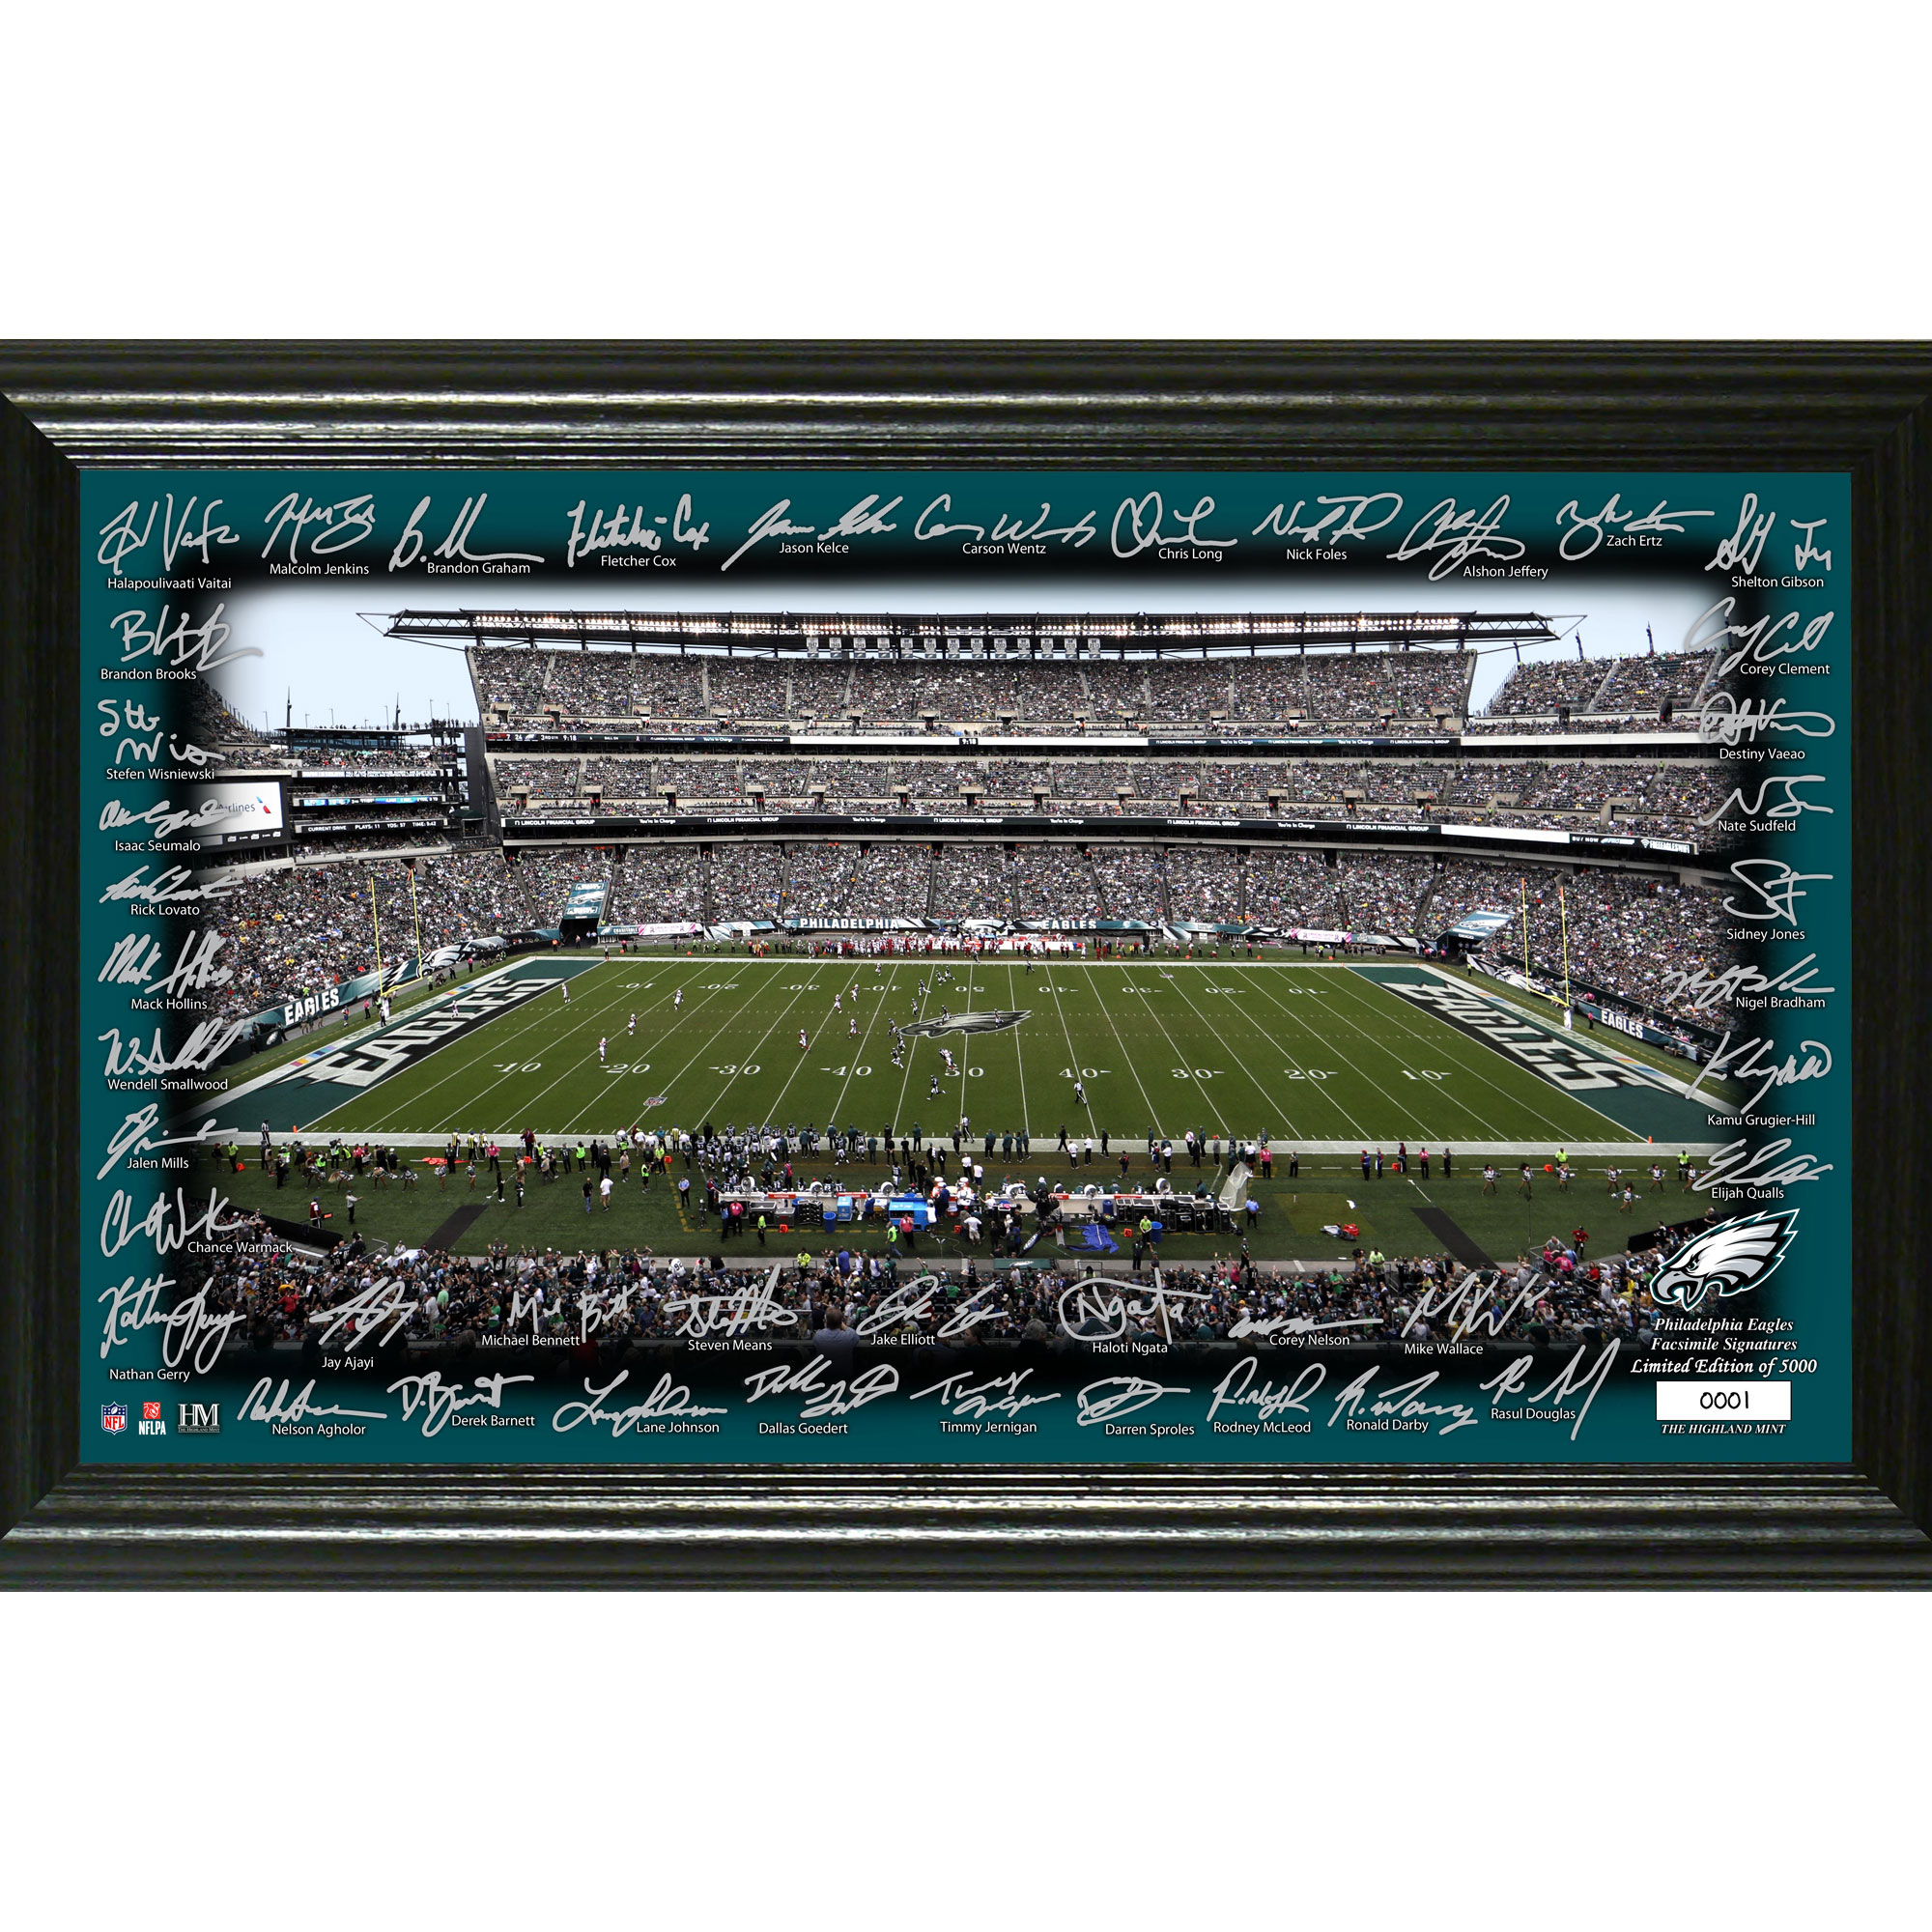 "Philadelphia Eagles Highland Mint 12"" x 20"" Signature Gridiron Panoramic Photo Mint - No Size"